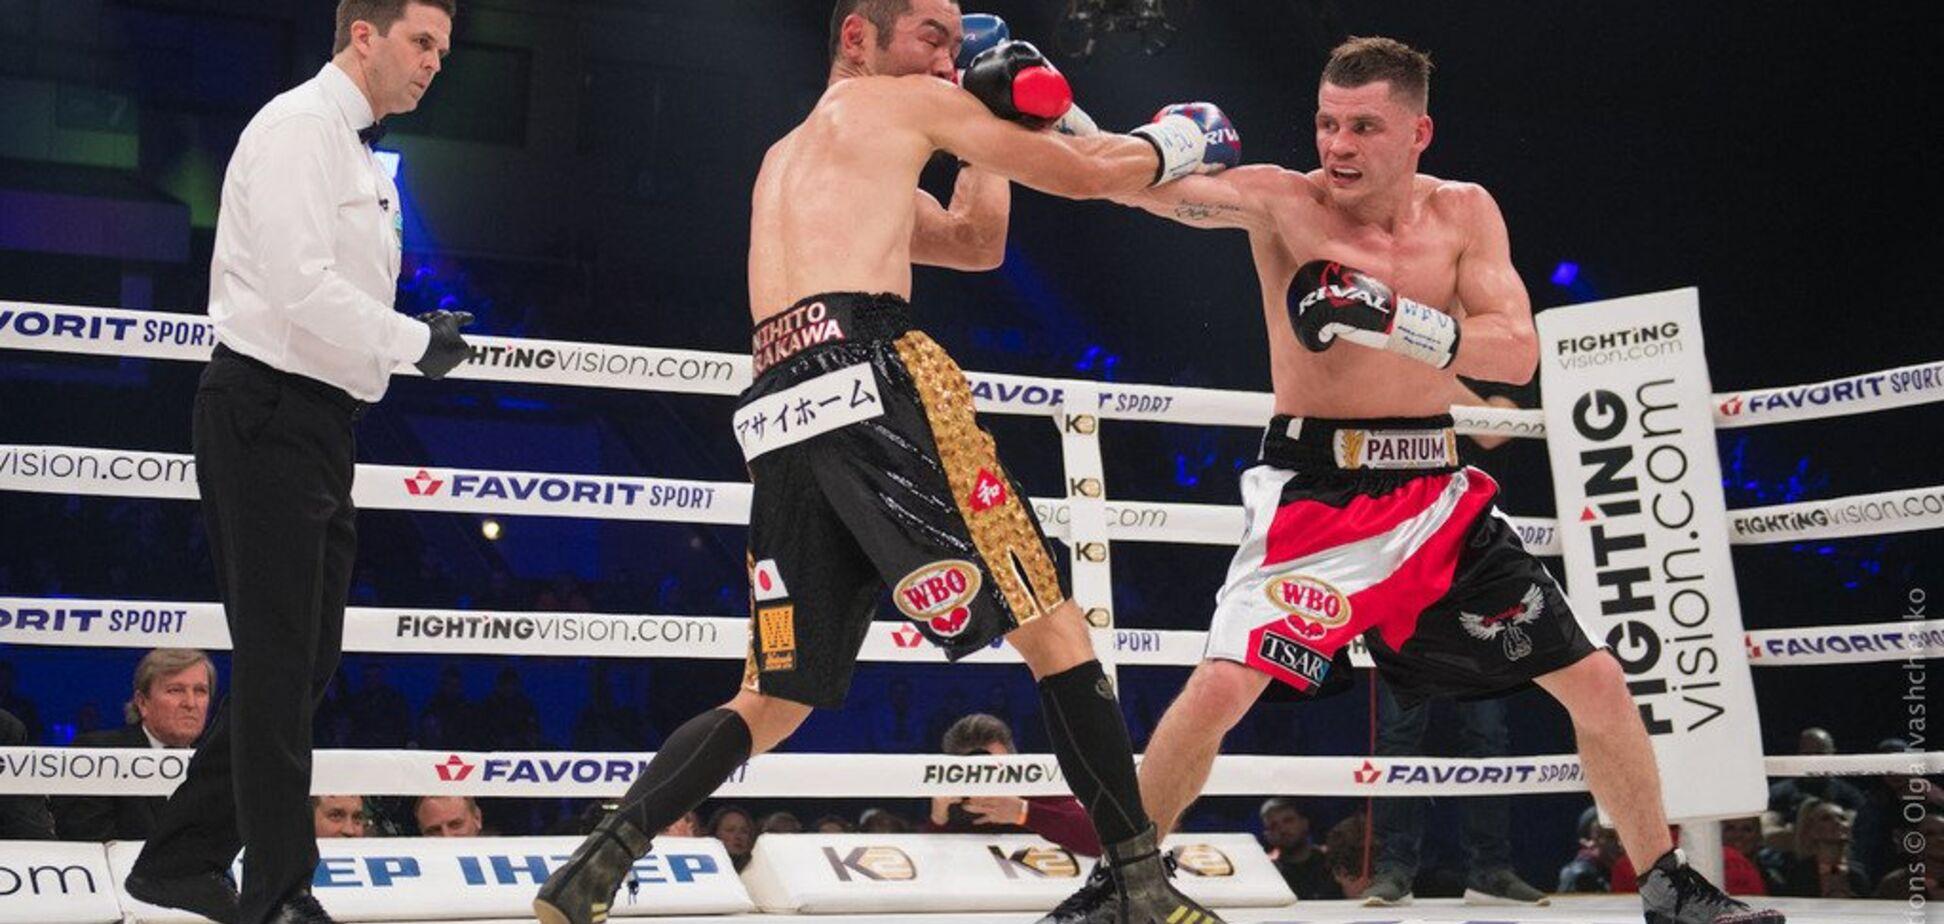 'Ми йдемо за тобою': український боксер кинув виклик Ломаченку